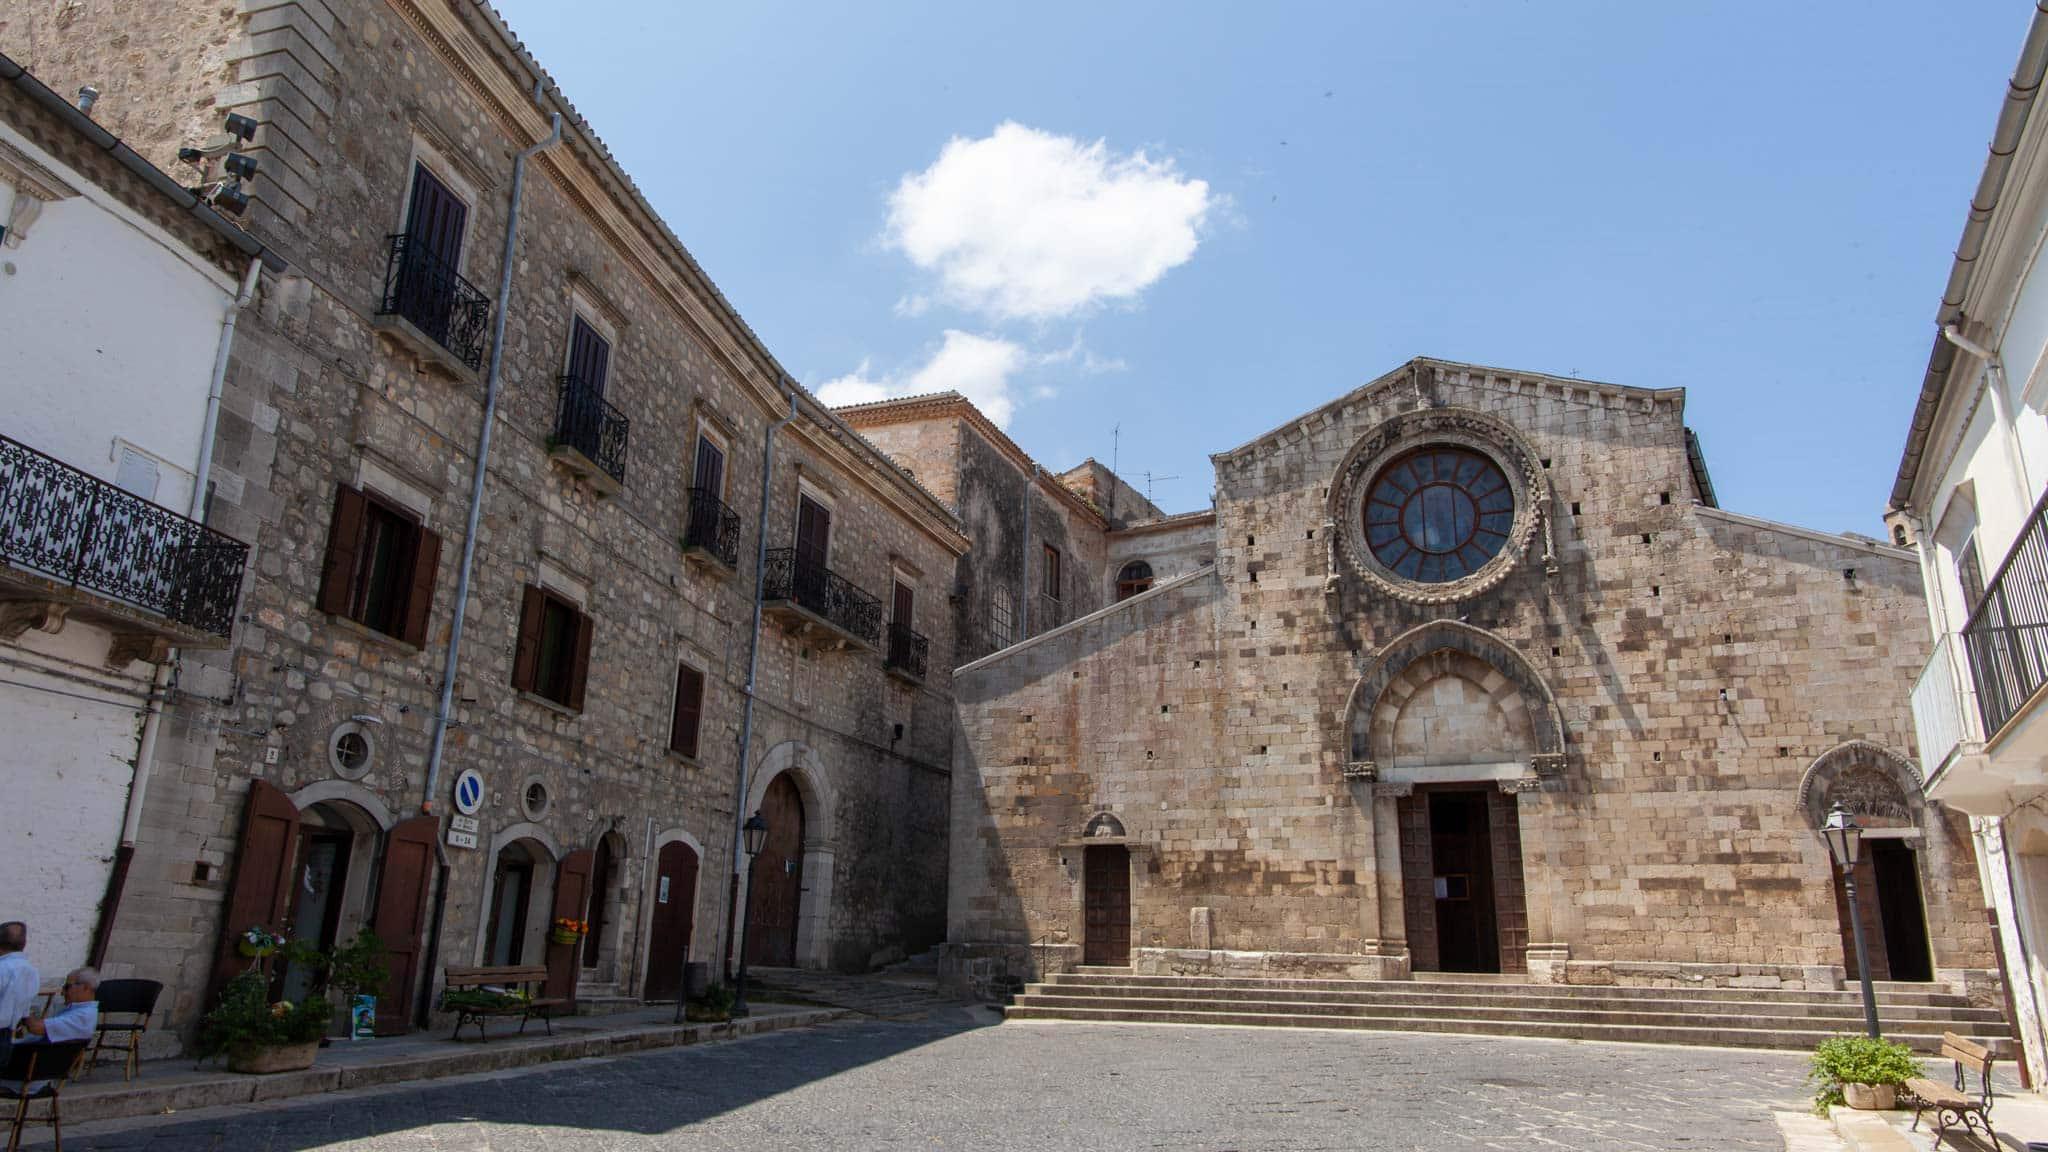 En la plaza de Bovino, Puglia, se encuentra la catedral principal